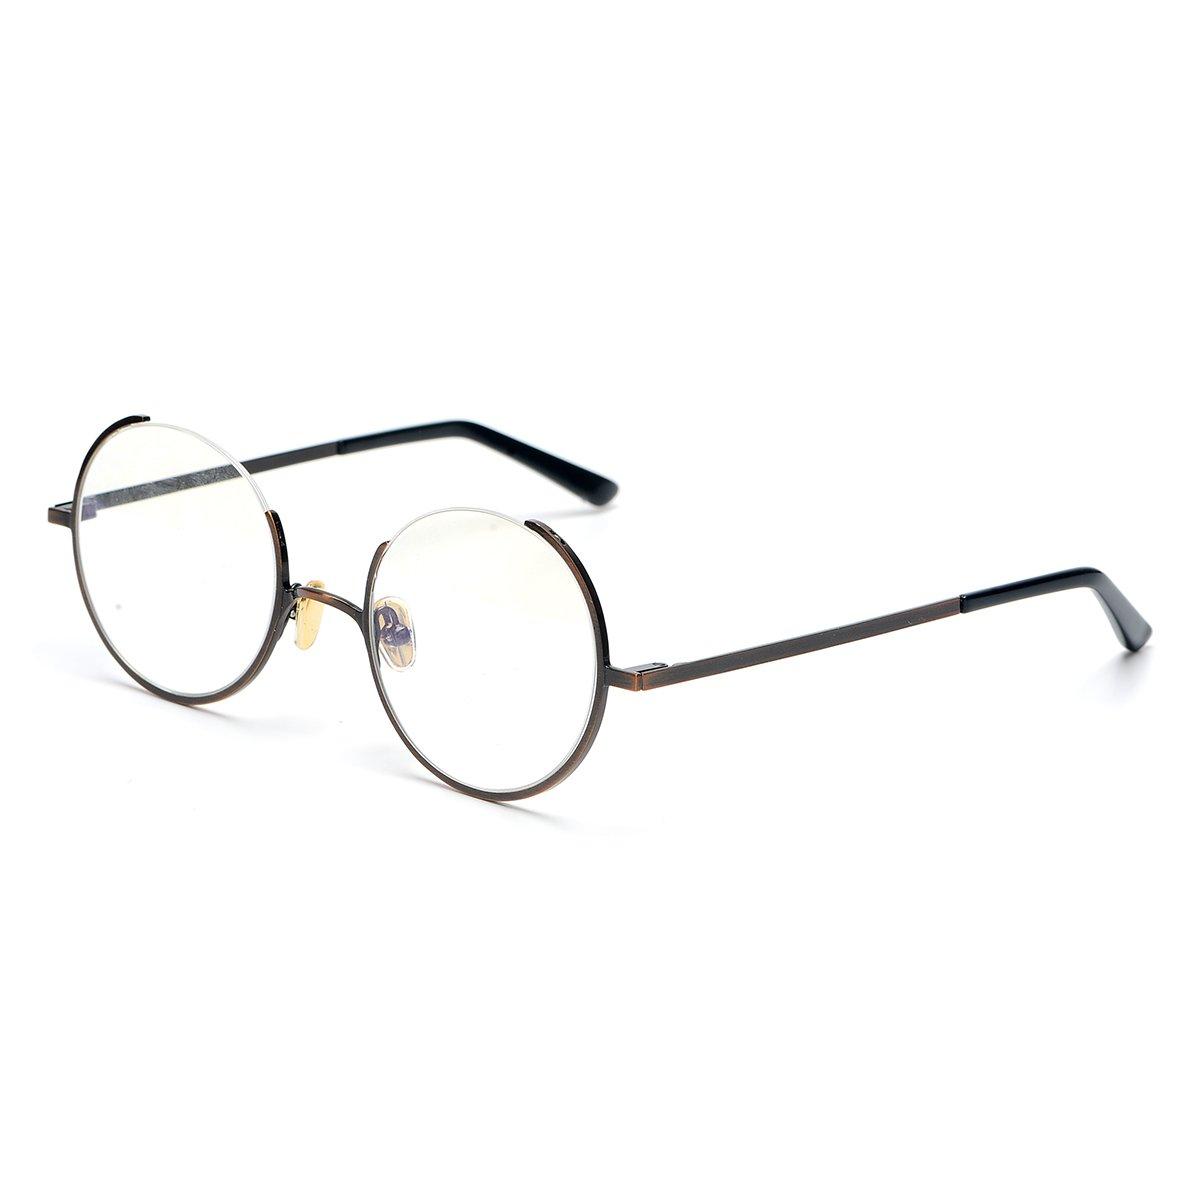 0ce86c0649 Amazon.com  SO SMOOTH WIND Glasses Frame Three Fourths Round Retro  Eyeglasses Gap design Prescription Eyewear Frame R1105 (Bronze